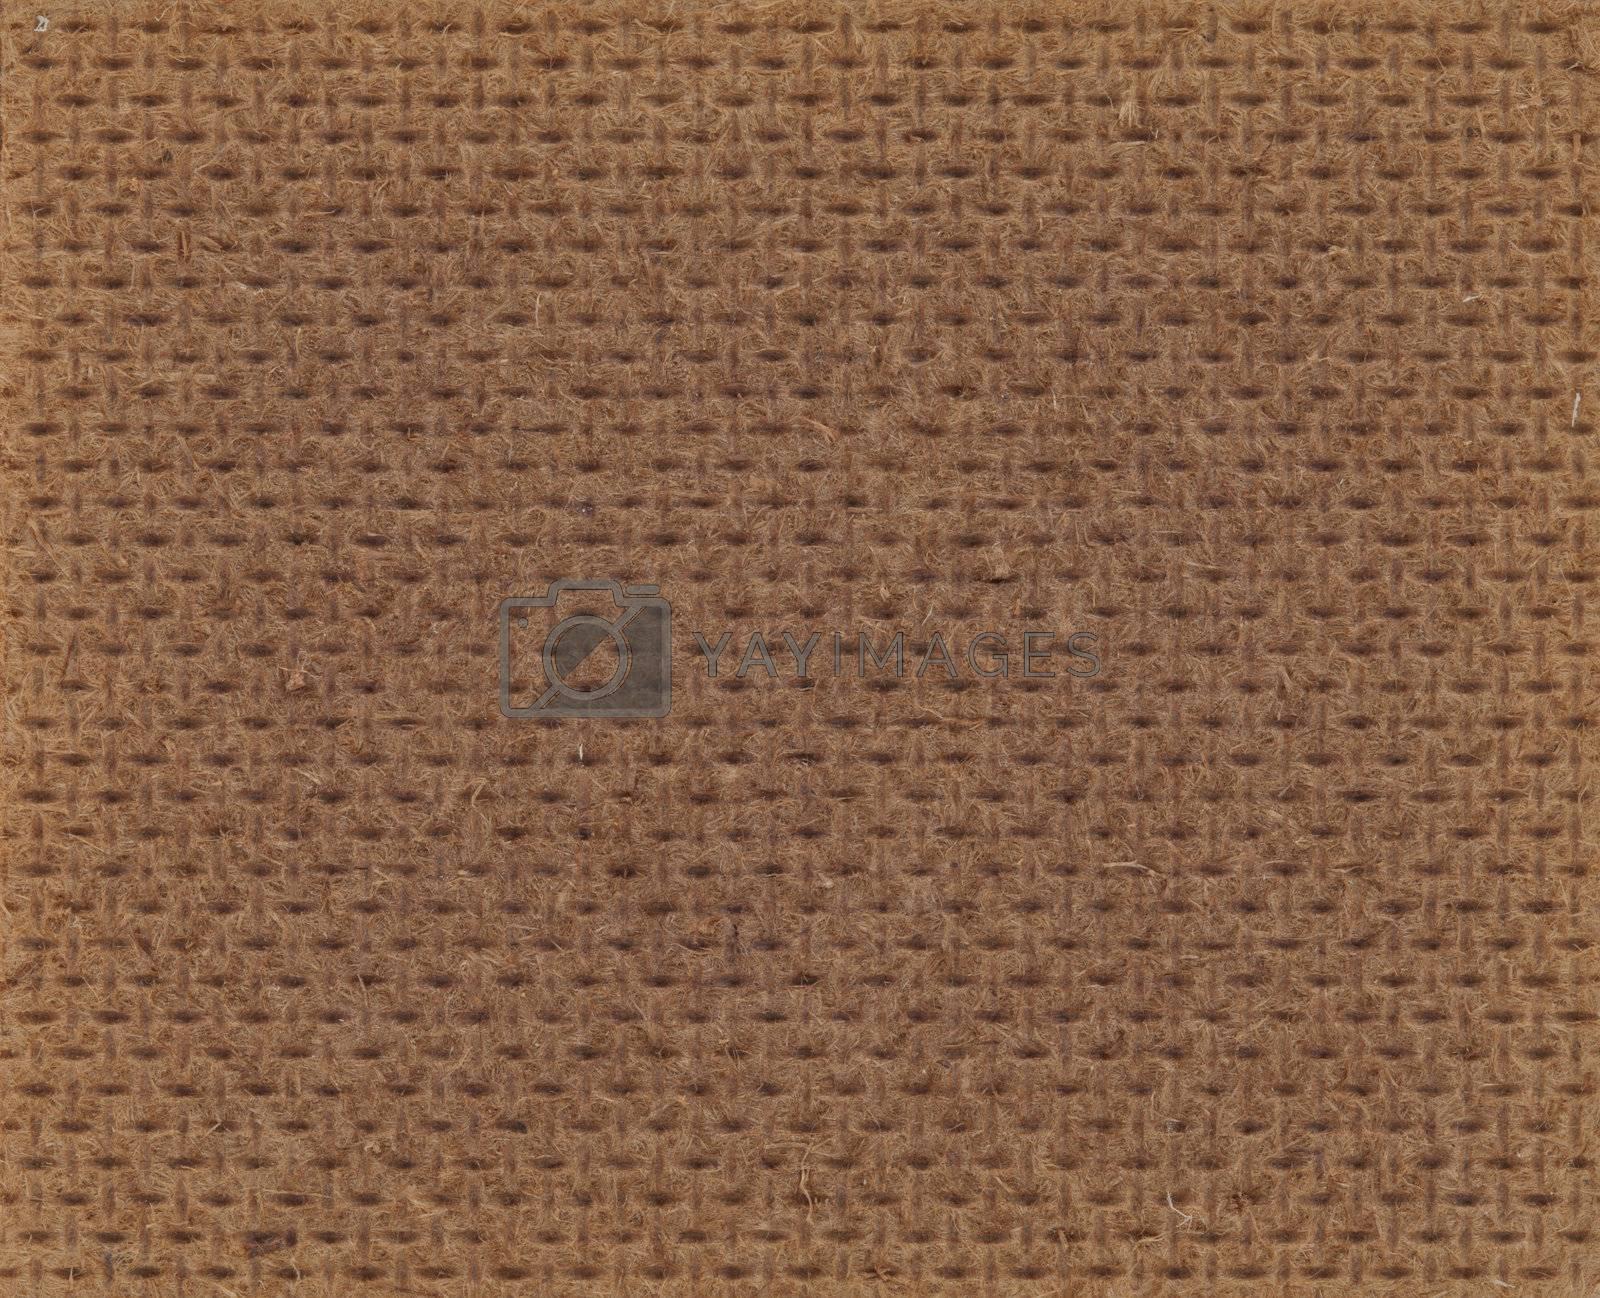 Cardboard. Seamless texture.